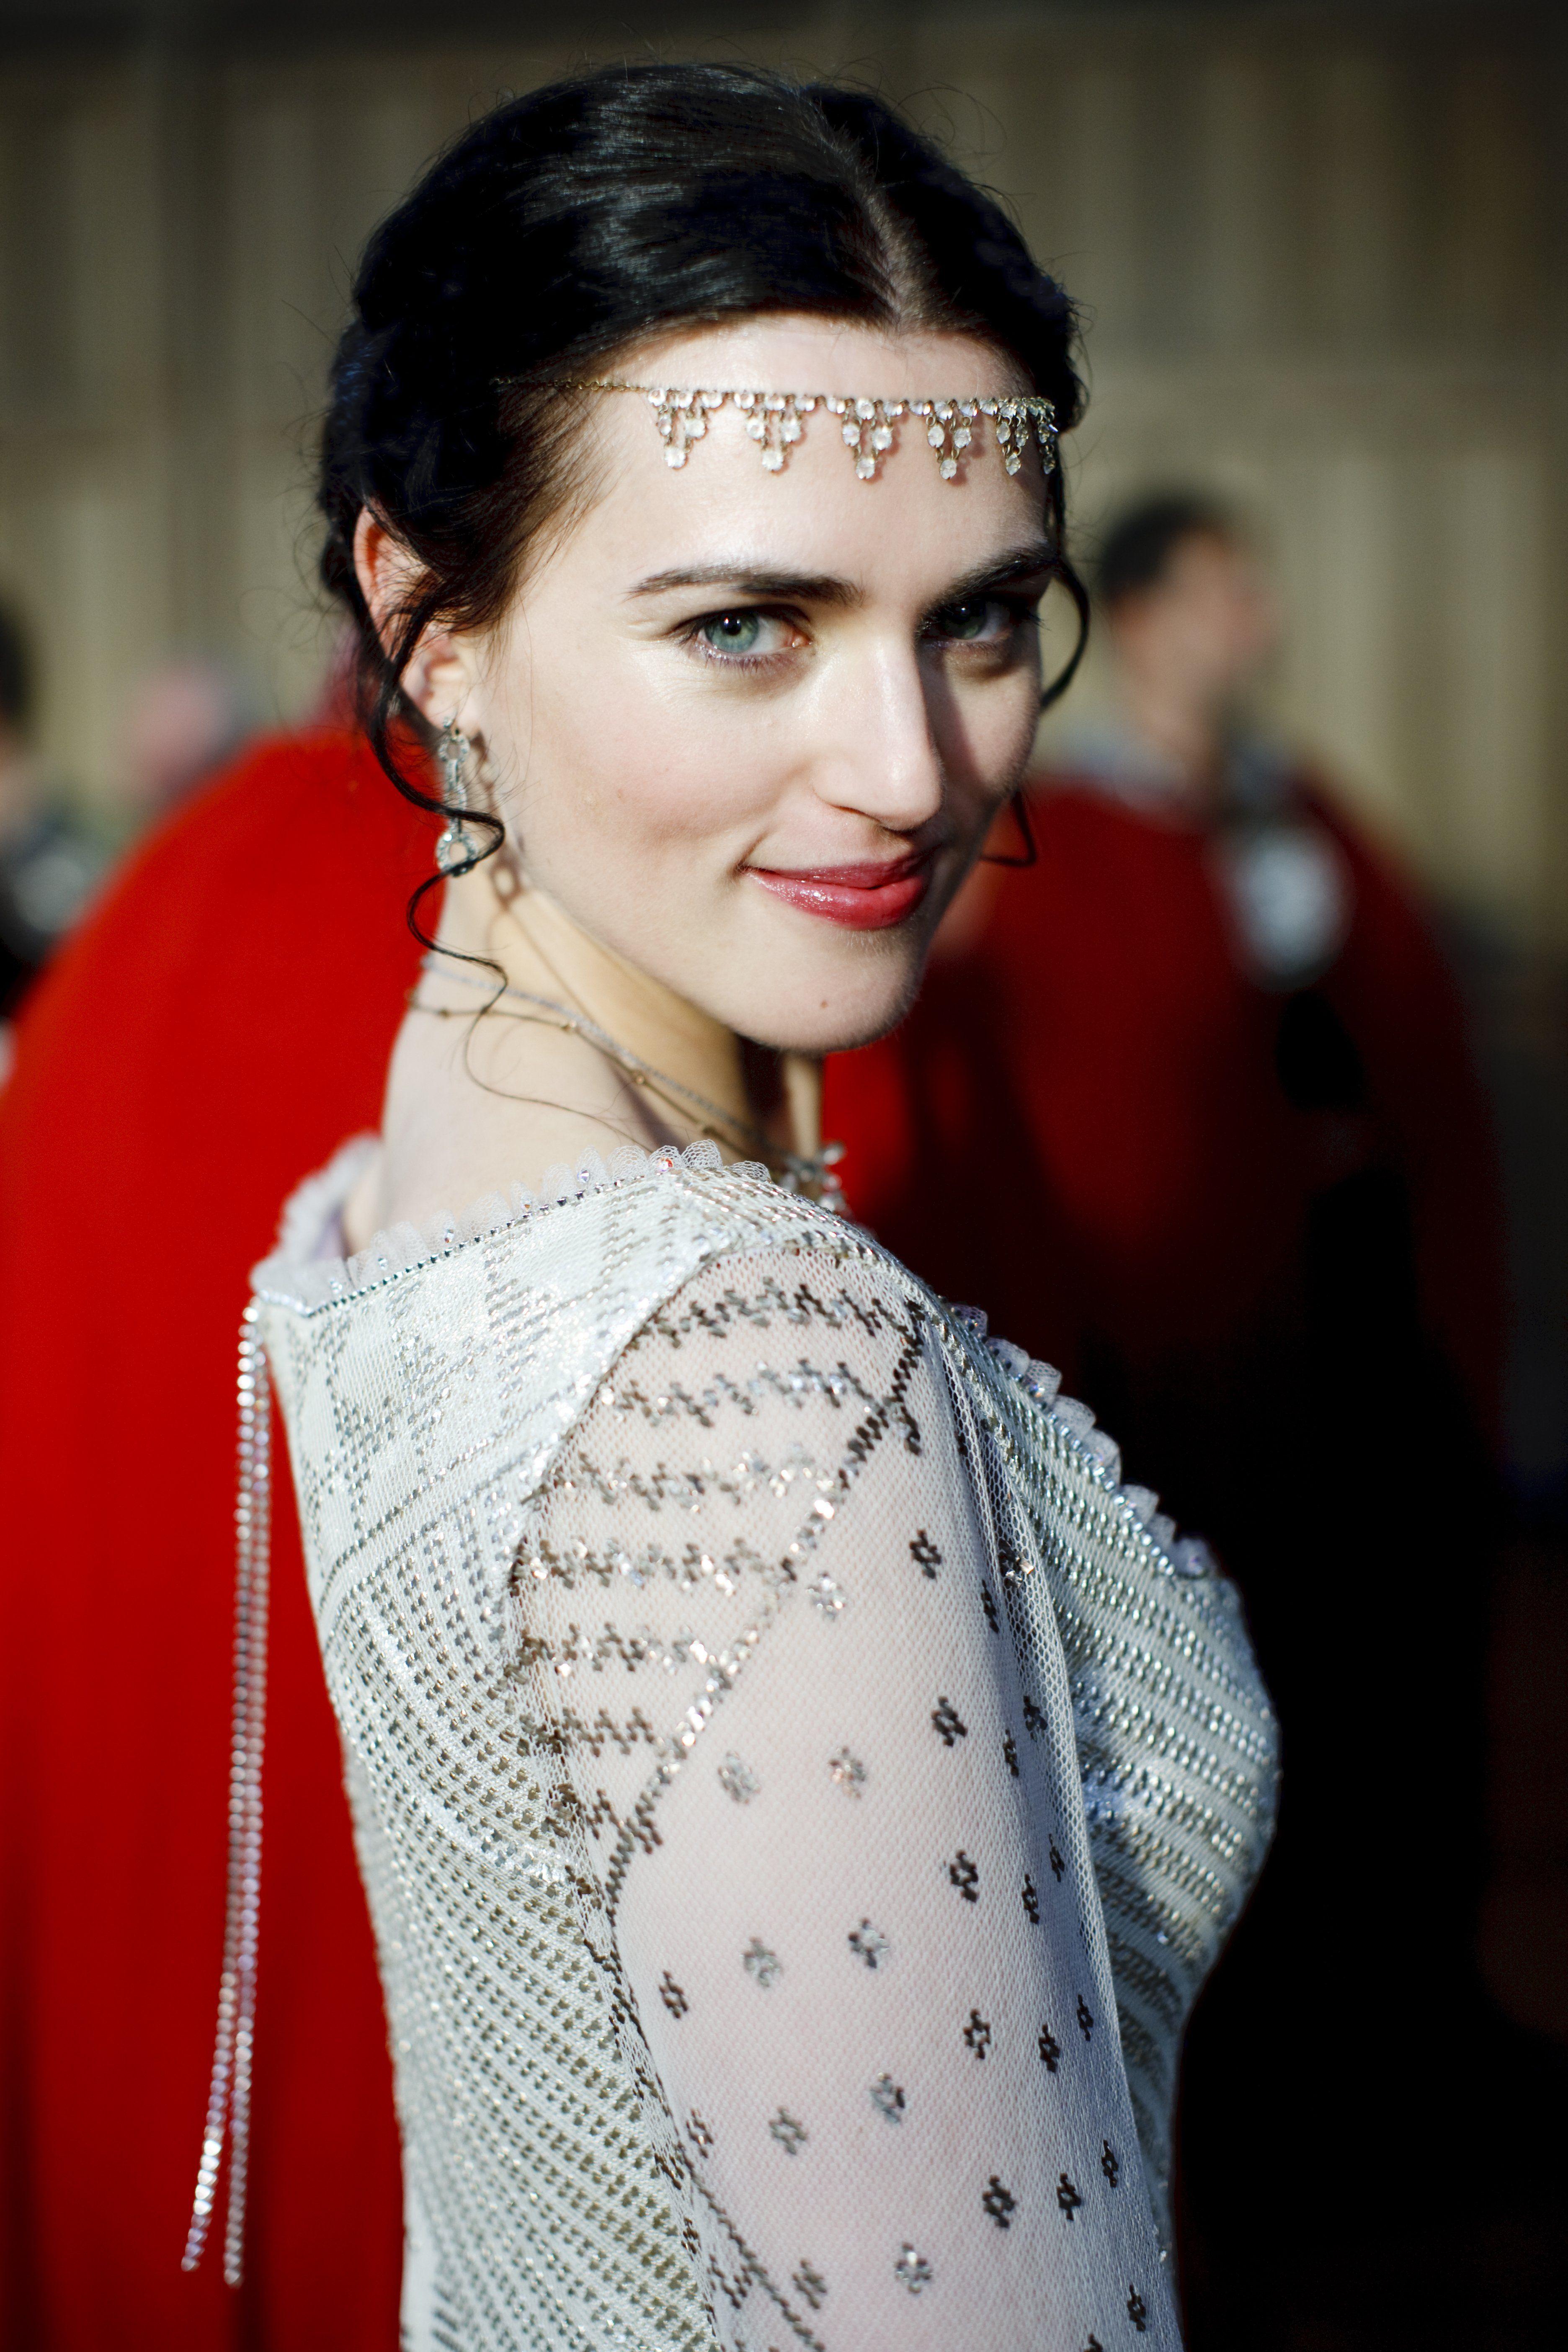 Katie as Morgana | Katie mcgrath, Mcgrath, Fashion tv